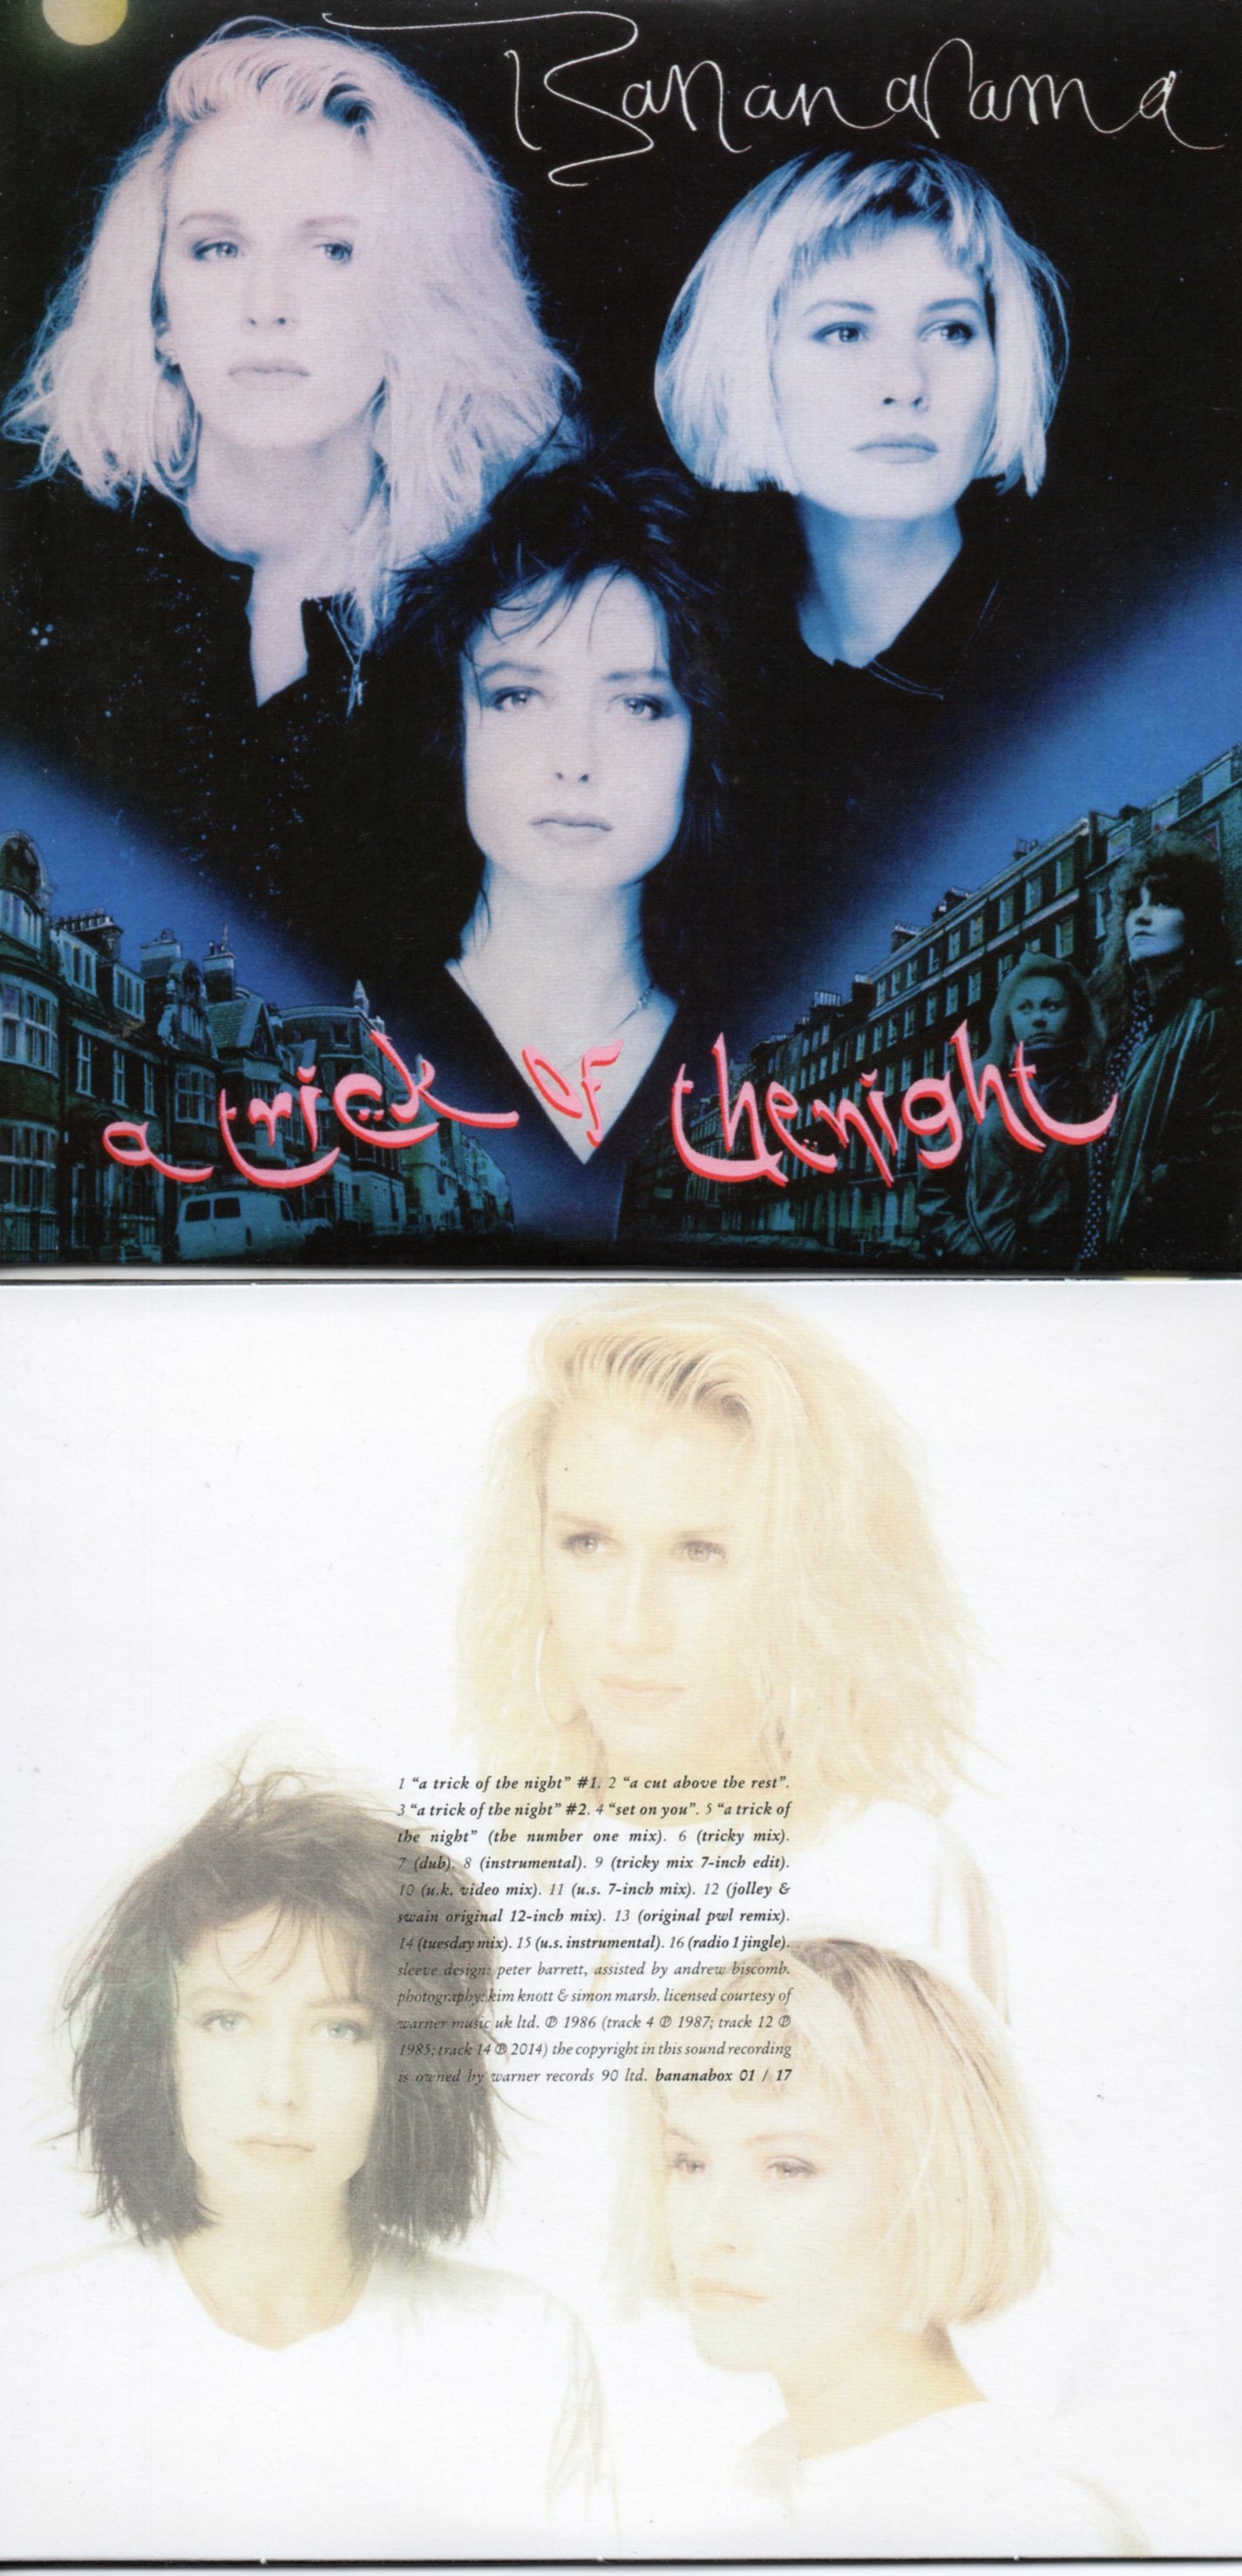 BANANARAMA - A TRICK OF THE NIGHT (1986) 16-TRACK CARD SLEEVE - CD single